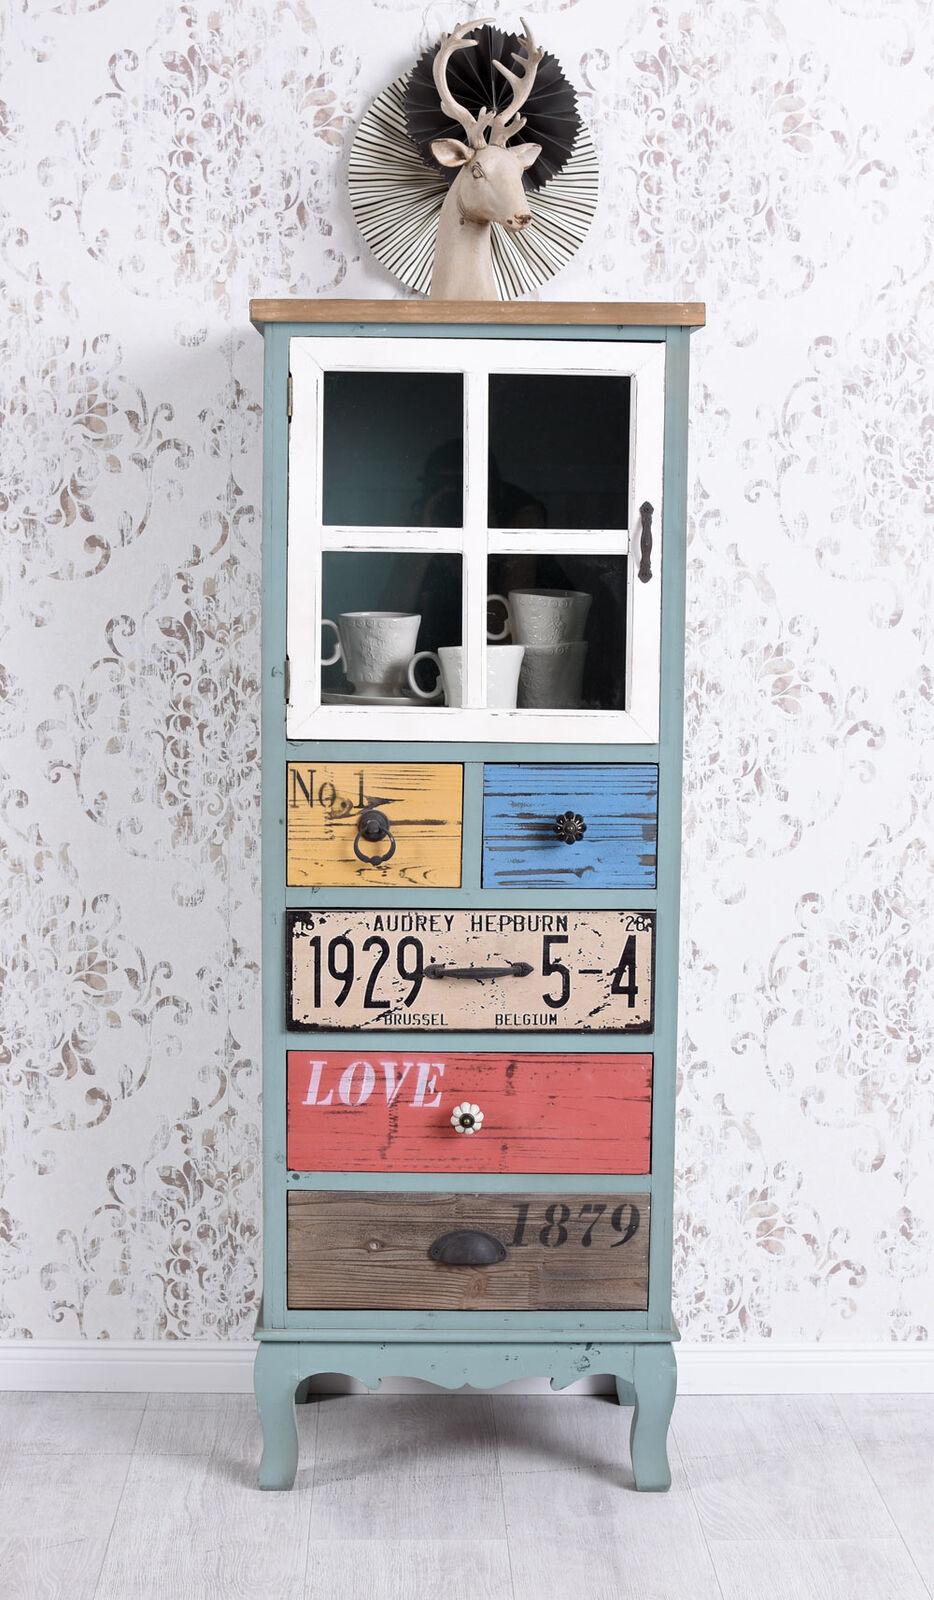 Hochkommode Vitrinenschrank Loft Schrank Industrie Design Kommode Vintage Holz